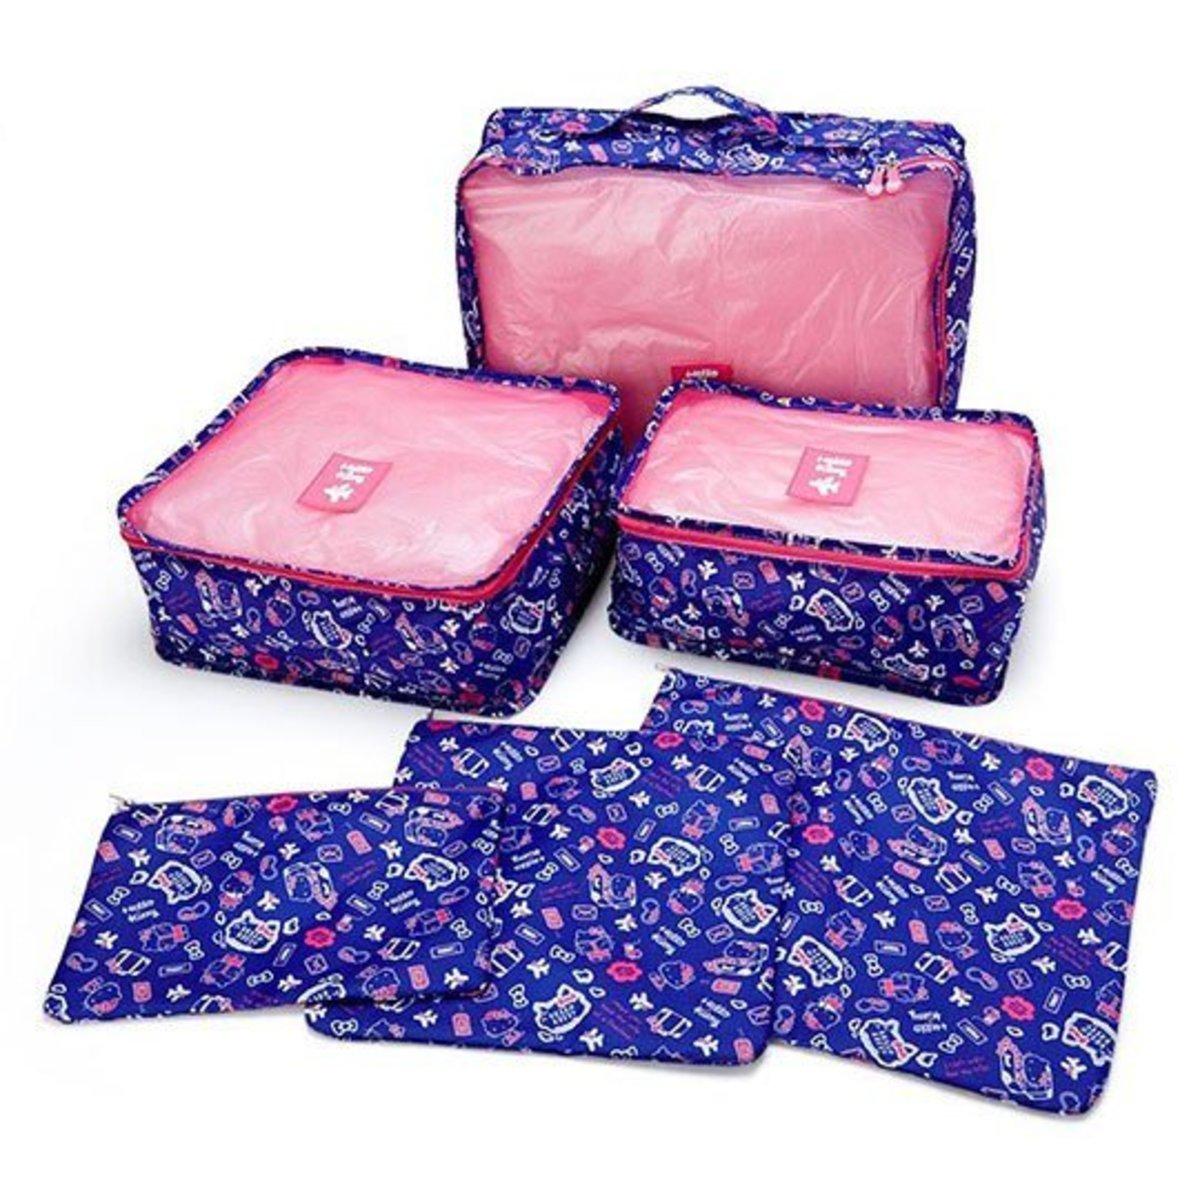 (Hello Kitty) 日本Sanrio 旅行收納袋 (1套6件) x 1套